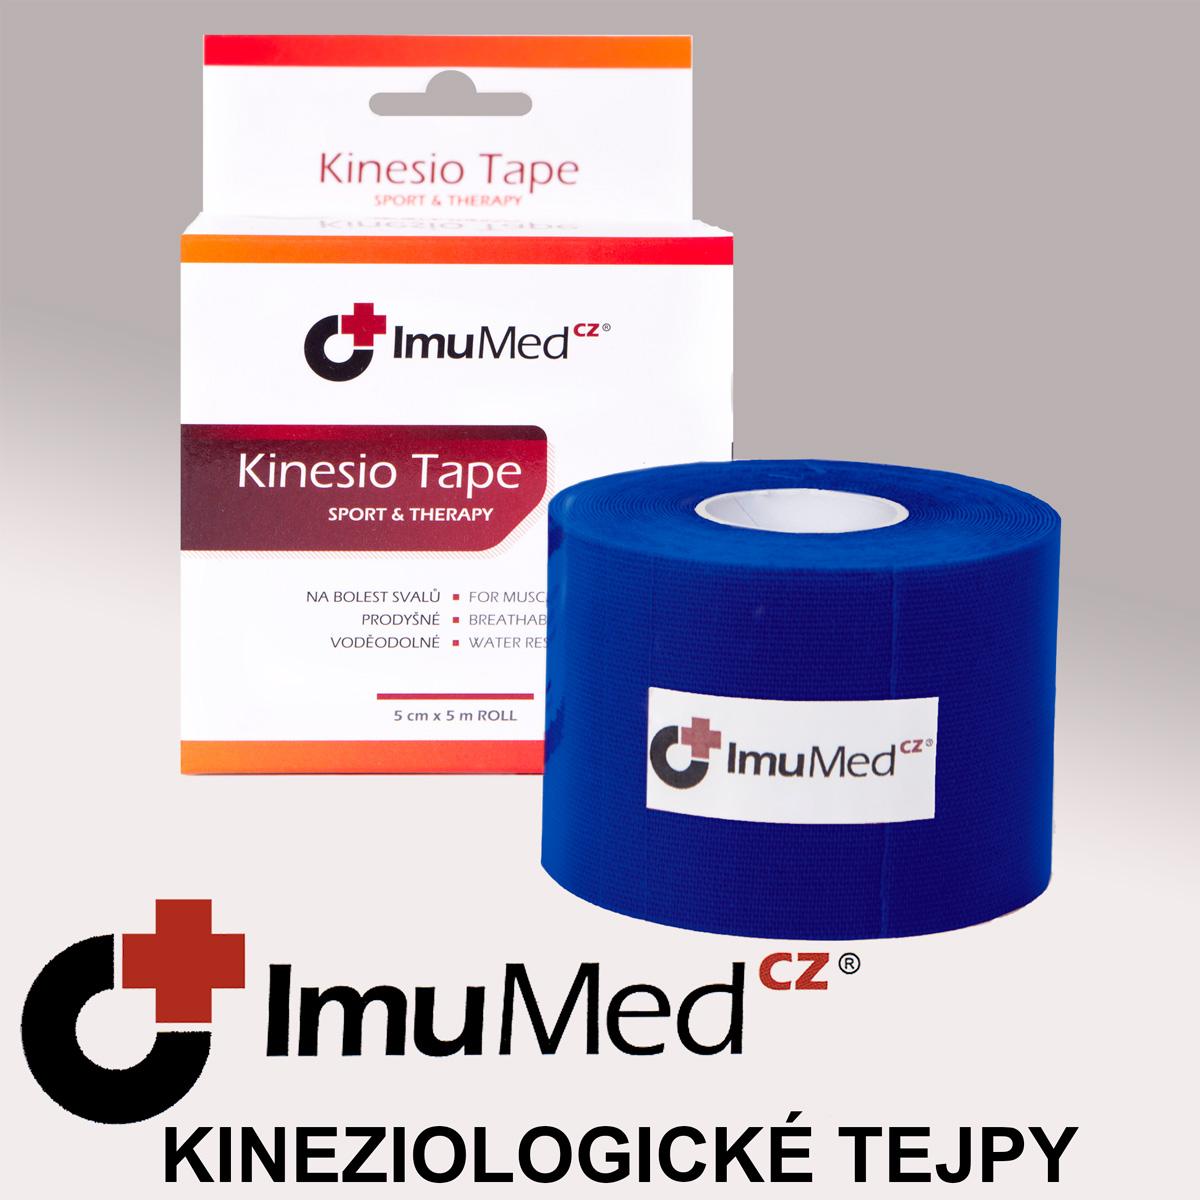 ImuMedCZ Kinesio Tape, tejpovací páska tmavě modrá 5 cm x 5 m ImuMedCZ Kineziologické tejpy